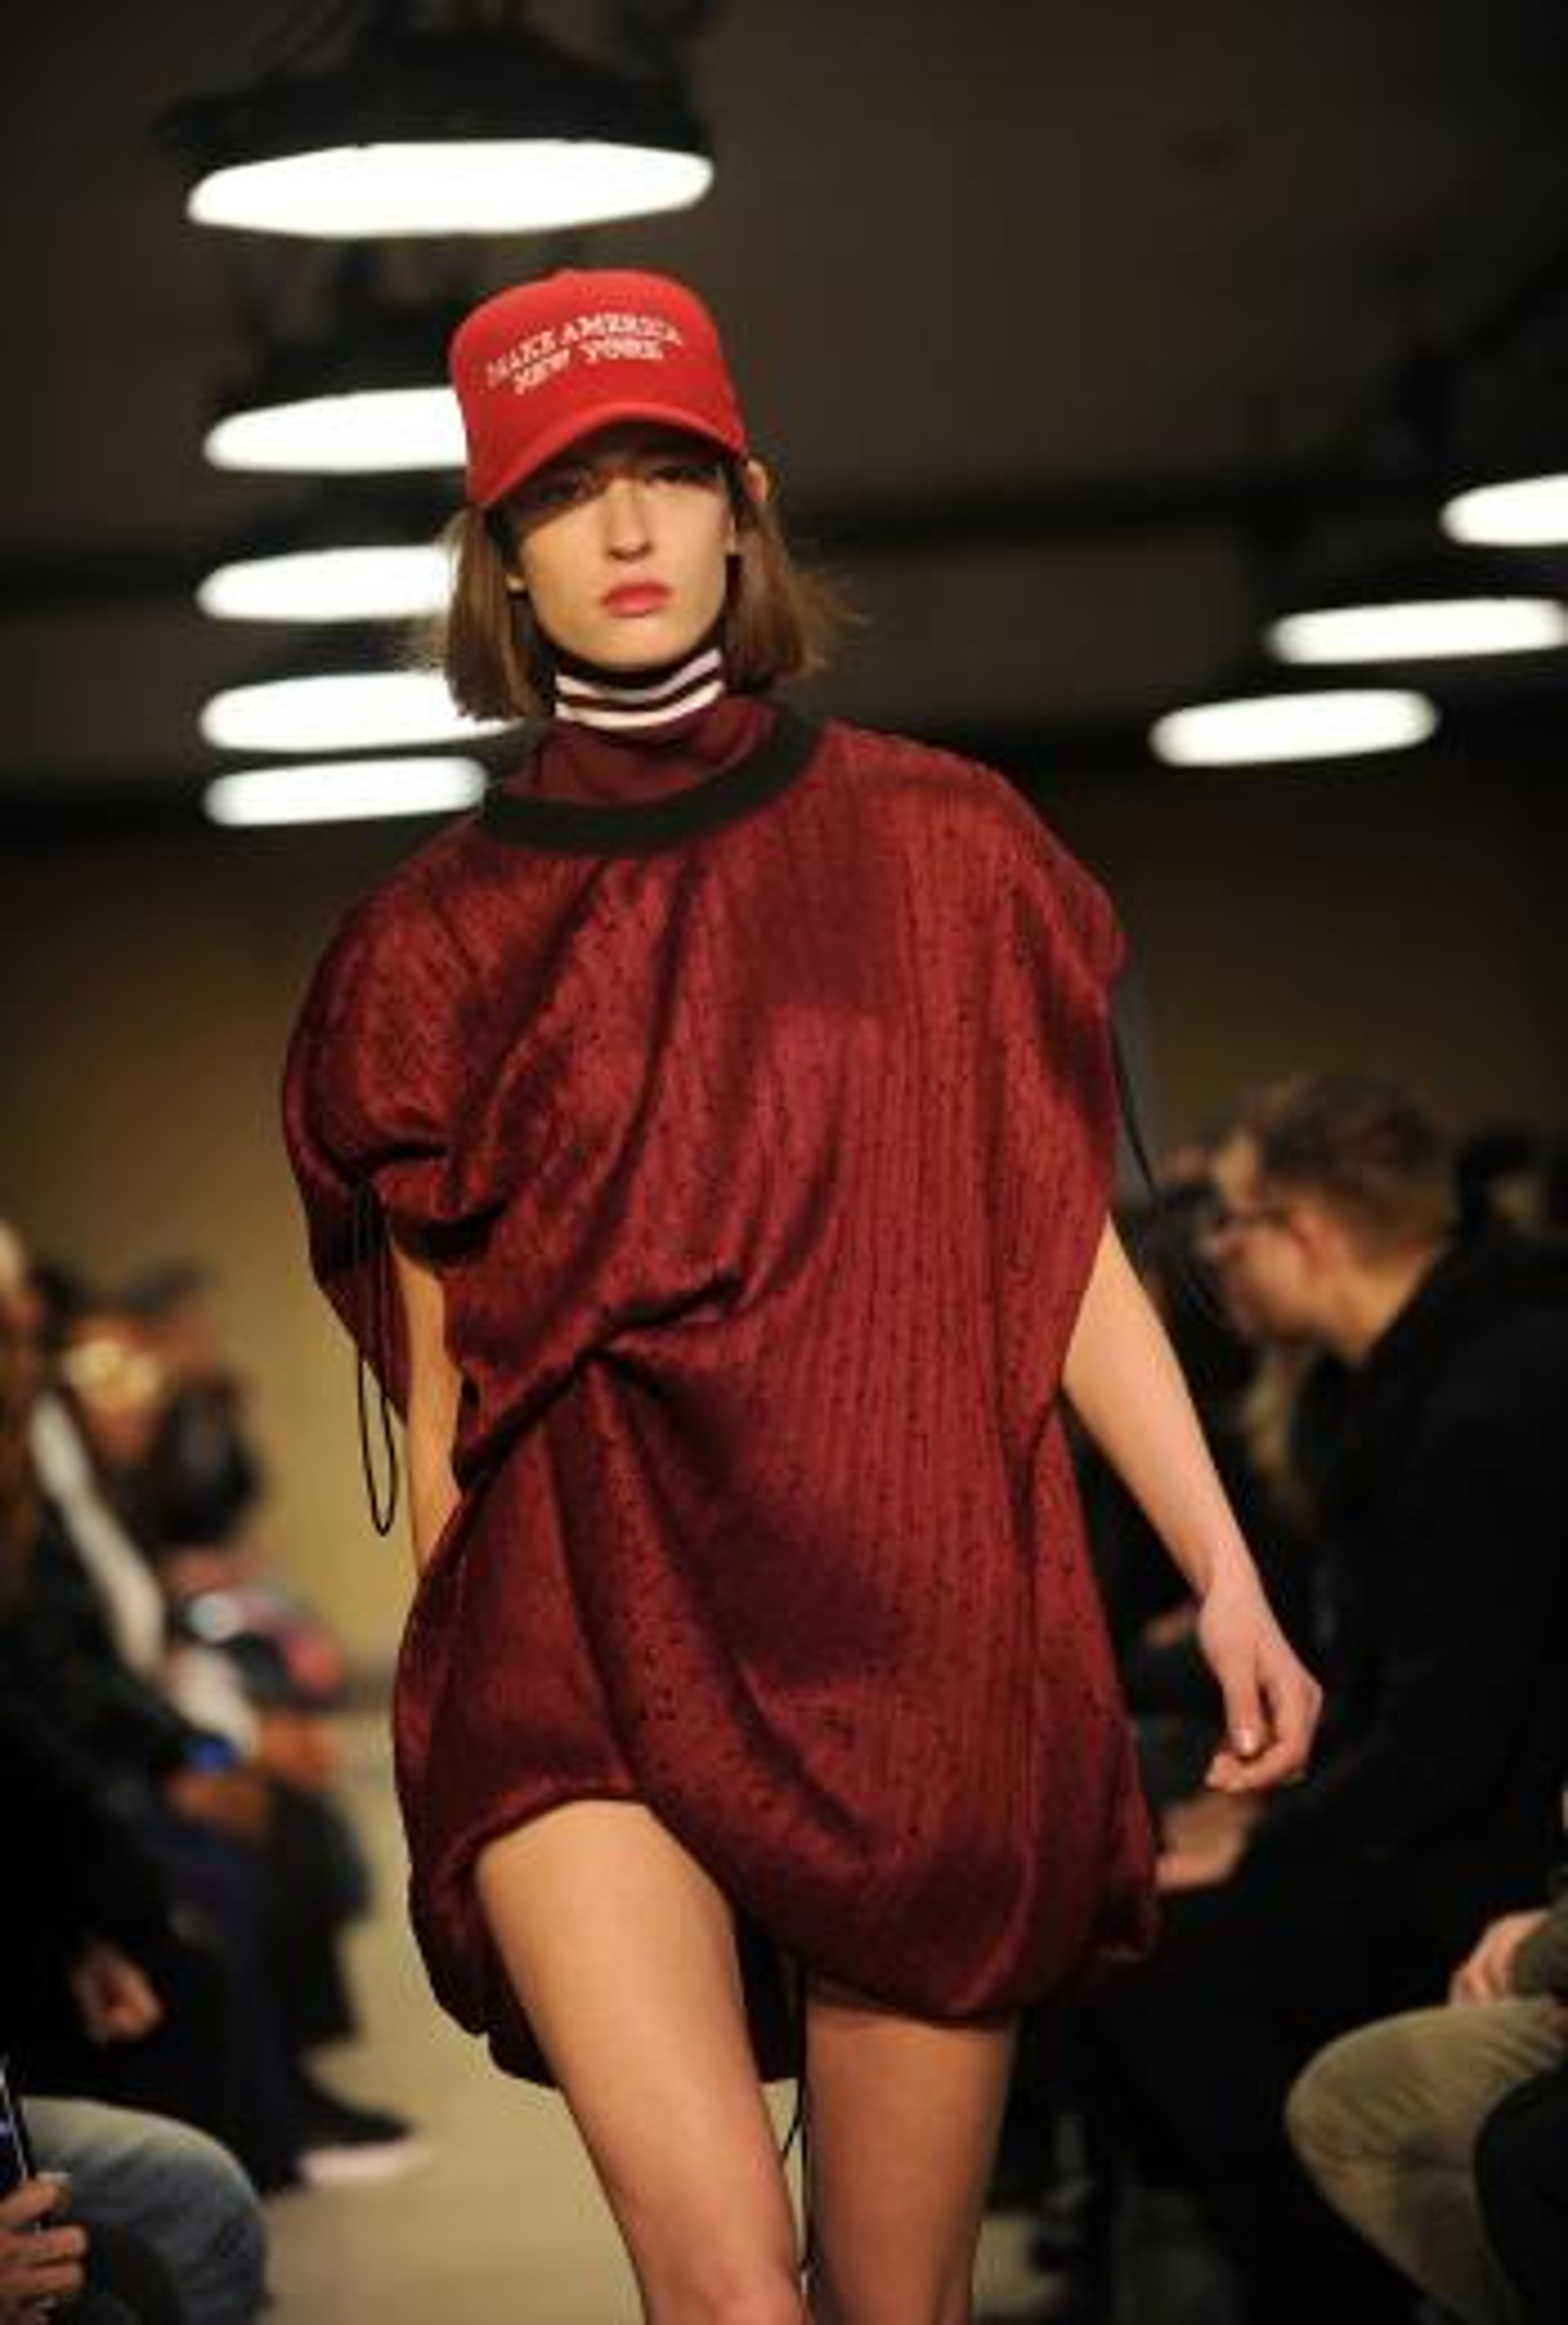 The Public School fashion collection is modeled during Fashion Week in New York, Sunday, Feb. 12, 2017. (AP Photo/Diane Bondareff)